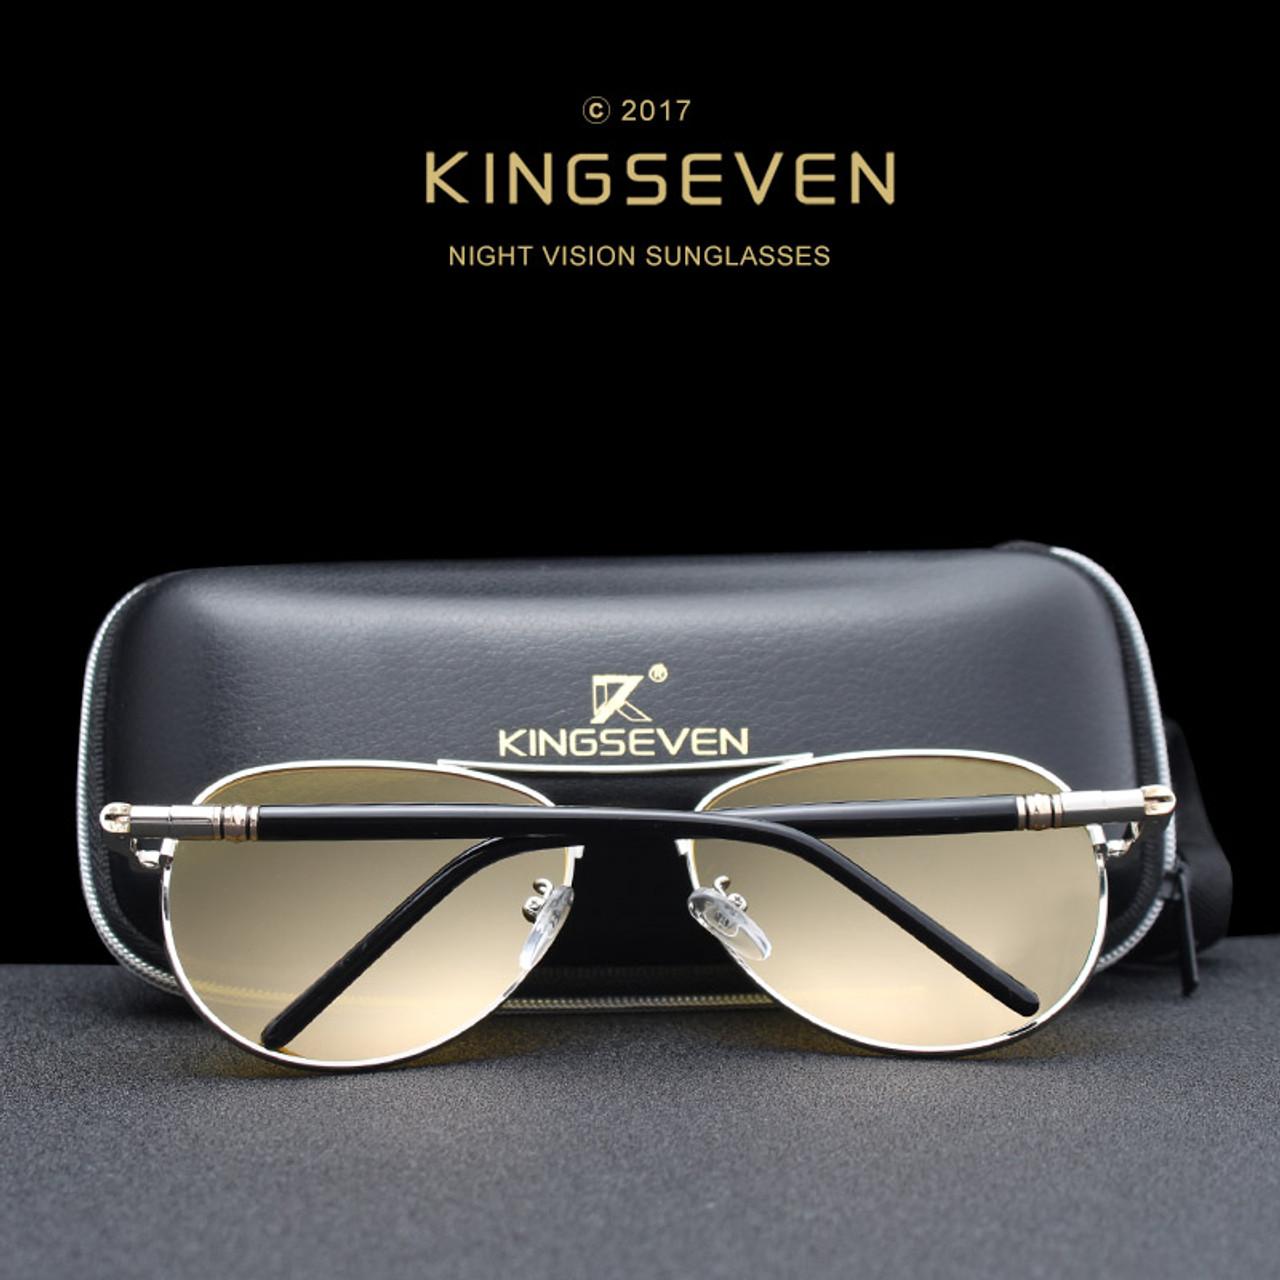 fbcdfb6342a ... 2017 Mens Polarized Night Driving Sunglasses Men Brand Designer Yellow  Lens Night Vision Driving Glasses Goggles ...